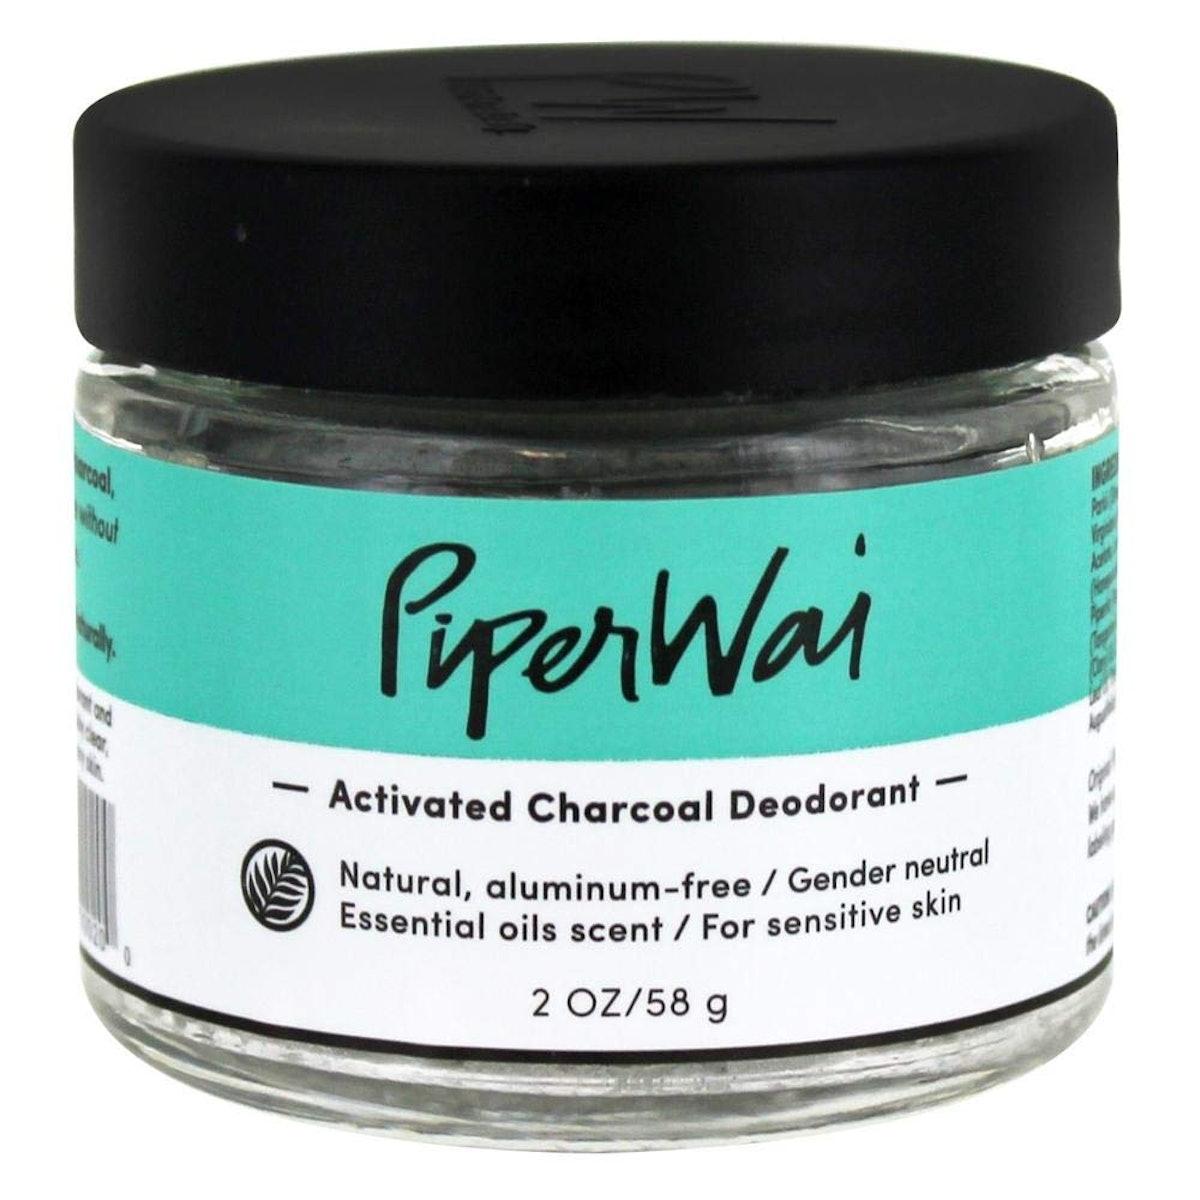 PiperWai Charcoal Deodorant